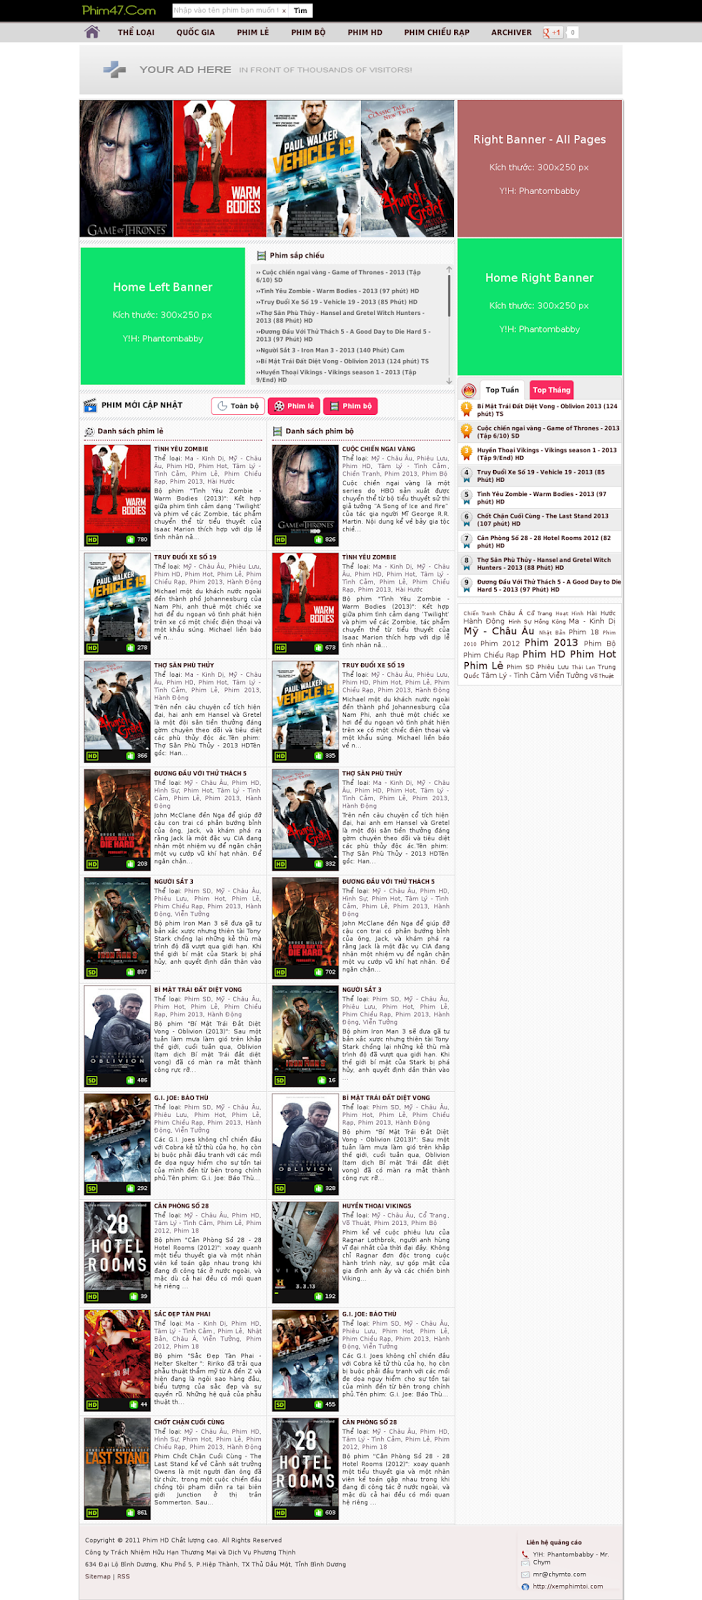 Share - Tổng hợp template xem phim Online cực đẹp cho Blogspot